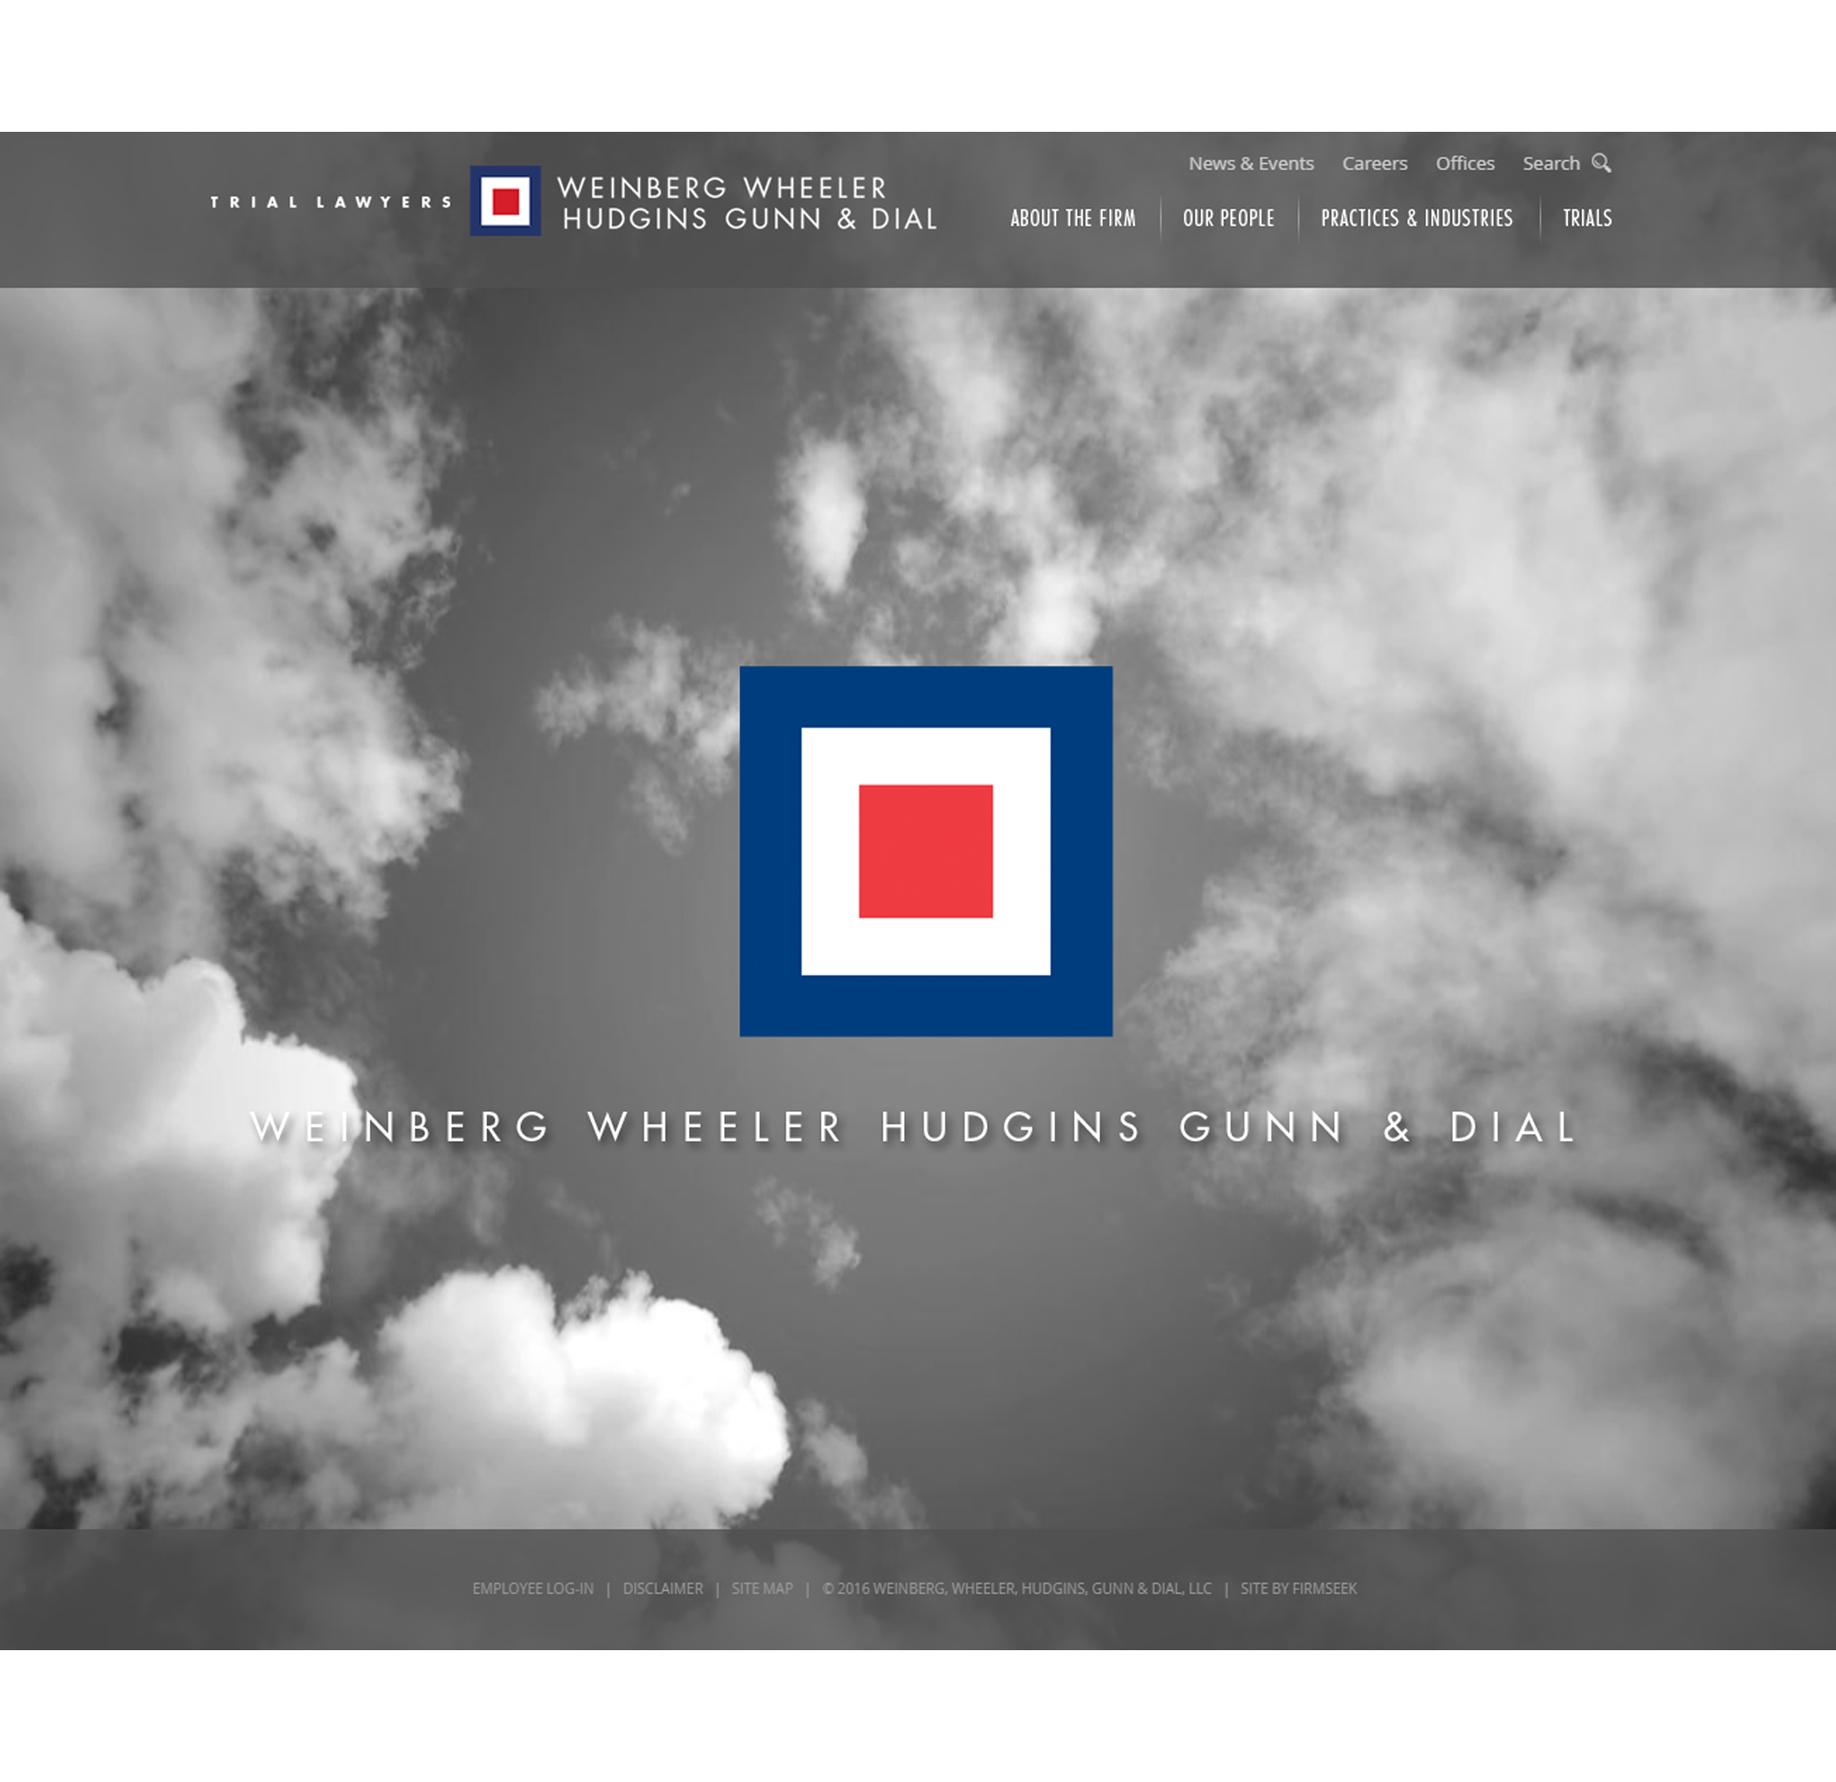 Weinberg Wheeler Website Design and Development Project image